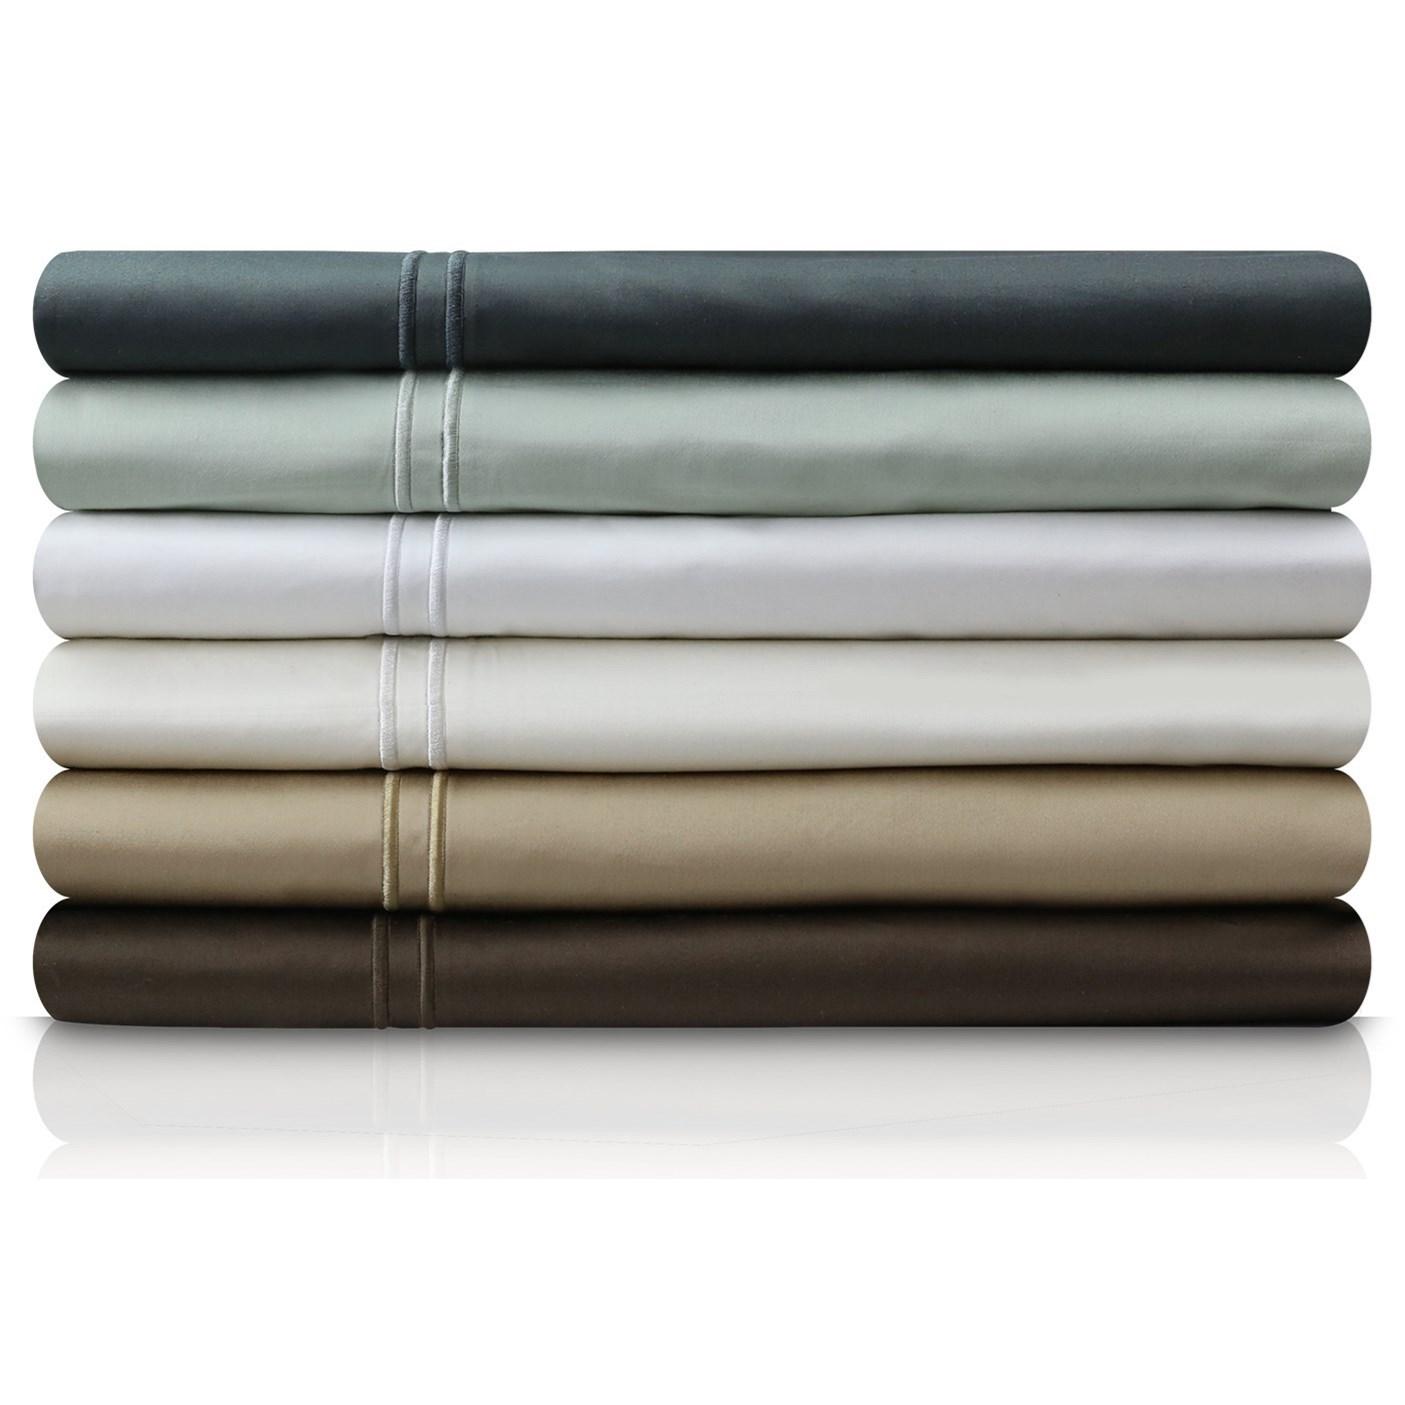 Malouf Egyptian Cotton Cal King 600 TC Egyptian Cotton Sheet Set - Item Number: MA06CKKHSS